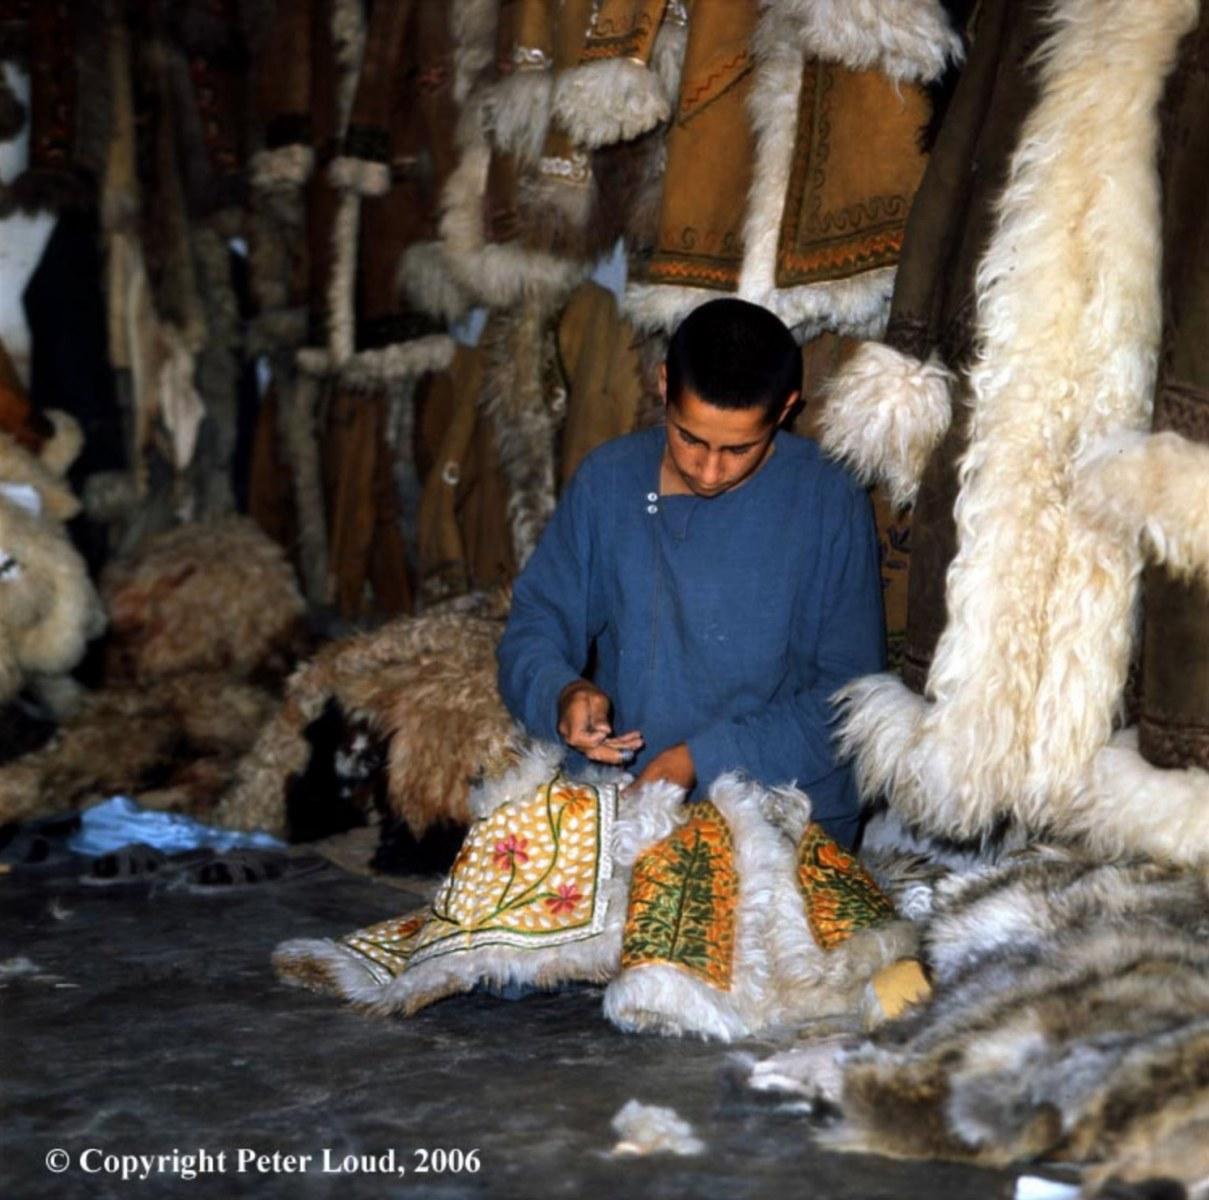 peter_loud_Afghan_Coat_Shop_1974_02